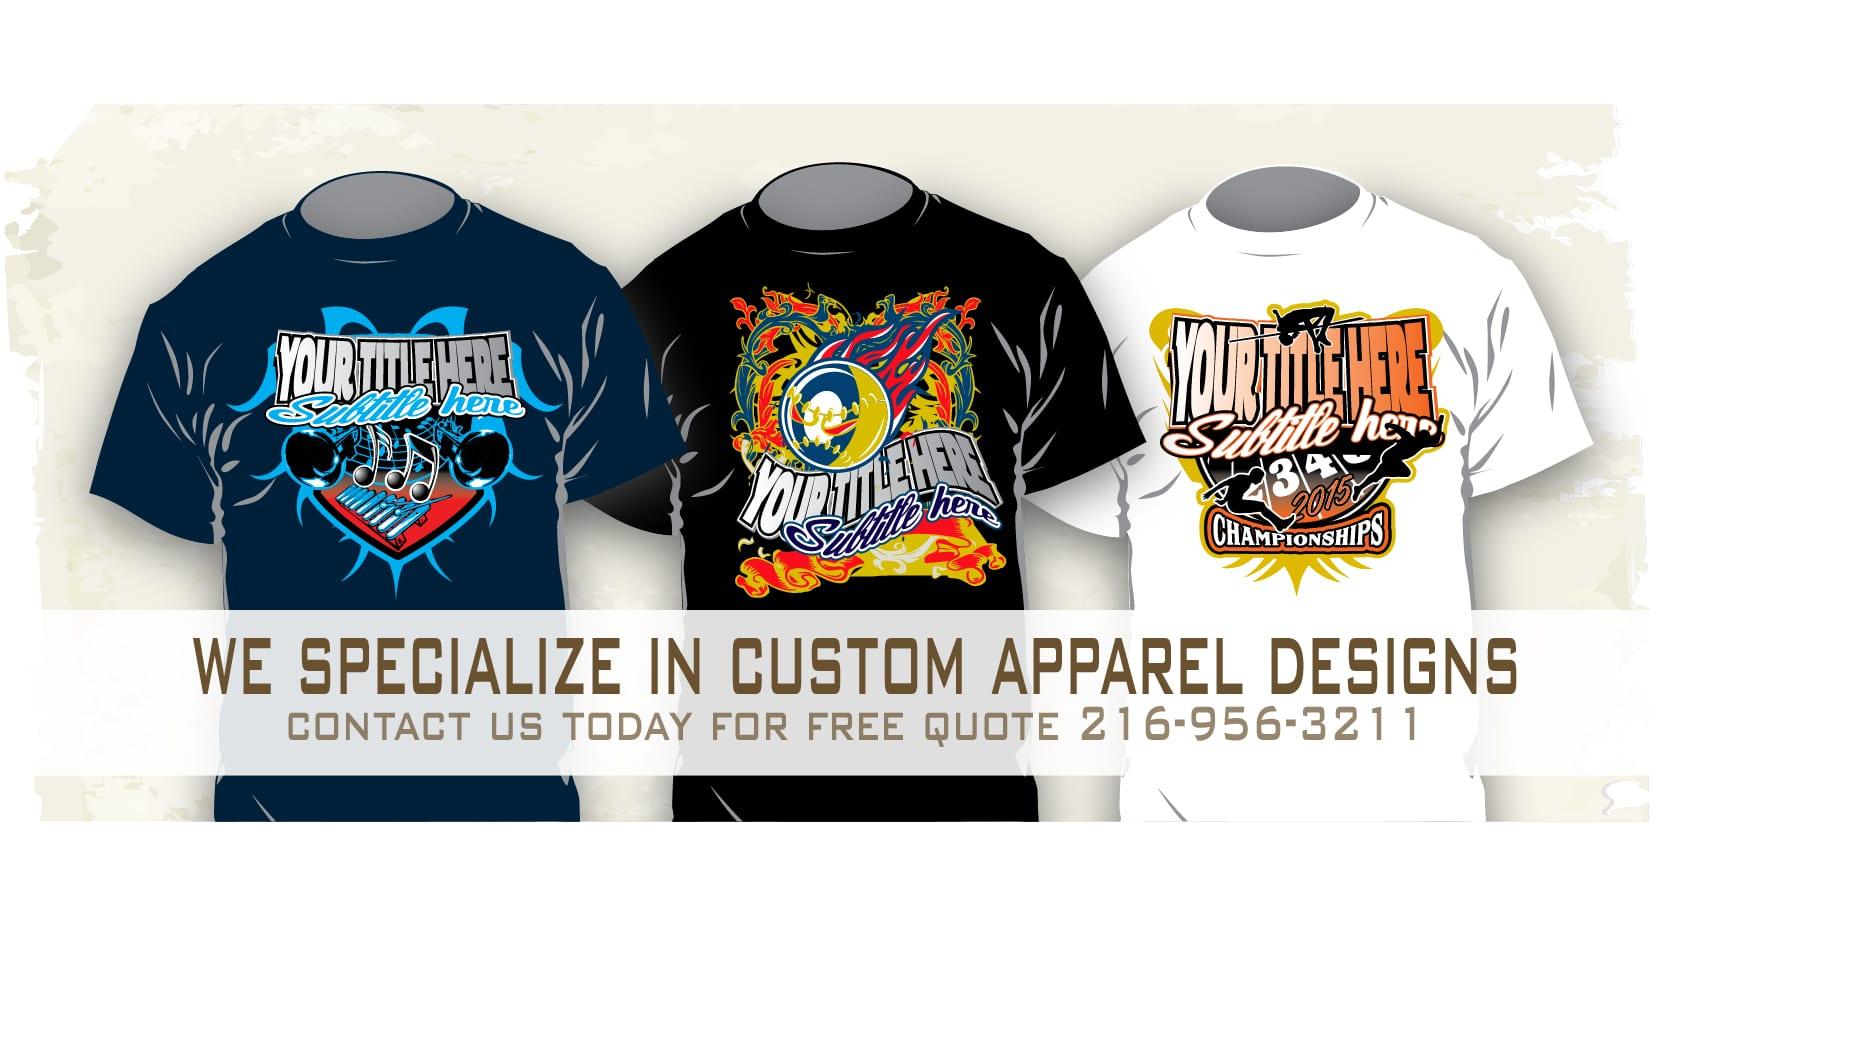 Custom apparel vector design templates for tshirts